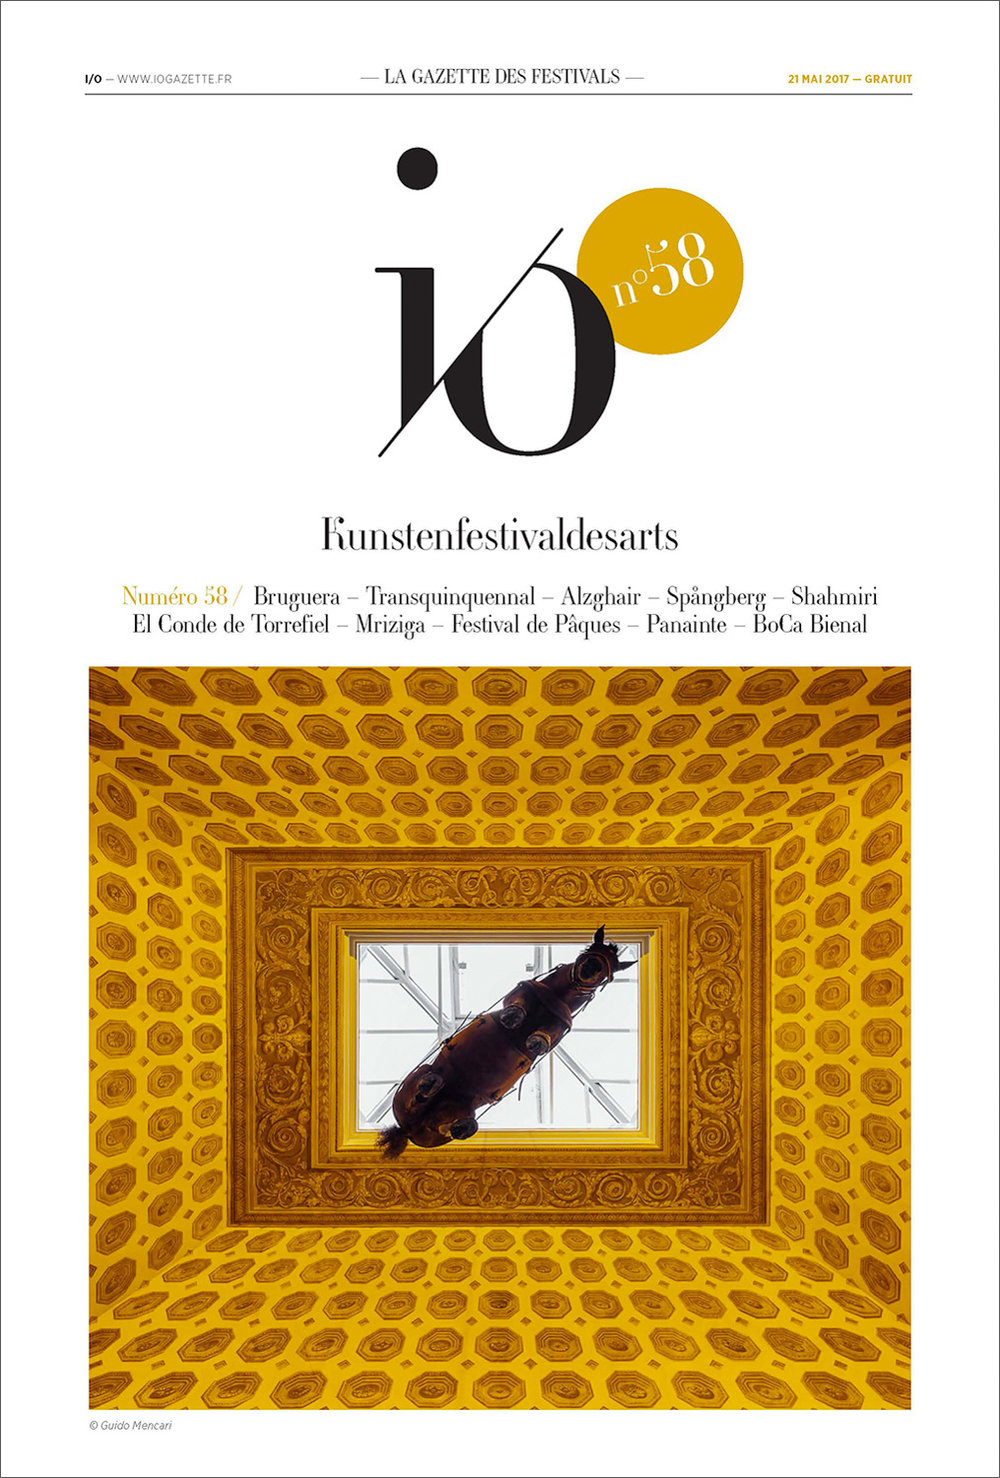 Maurizio Cattelan   Novecento    Magazine cover   Io Gazzette, 2017